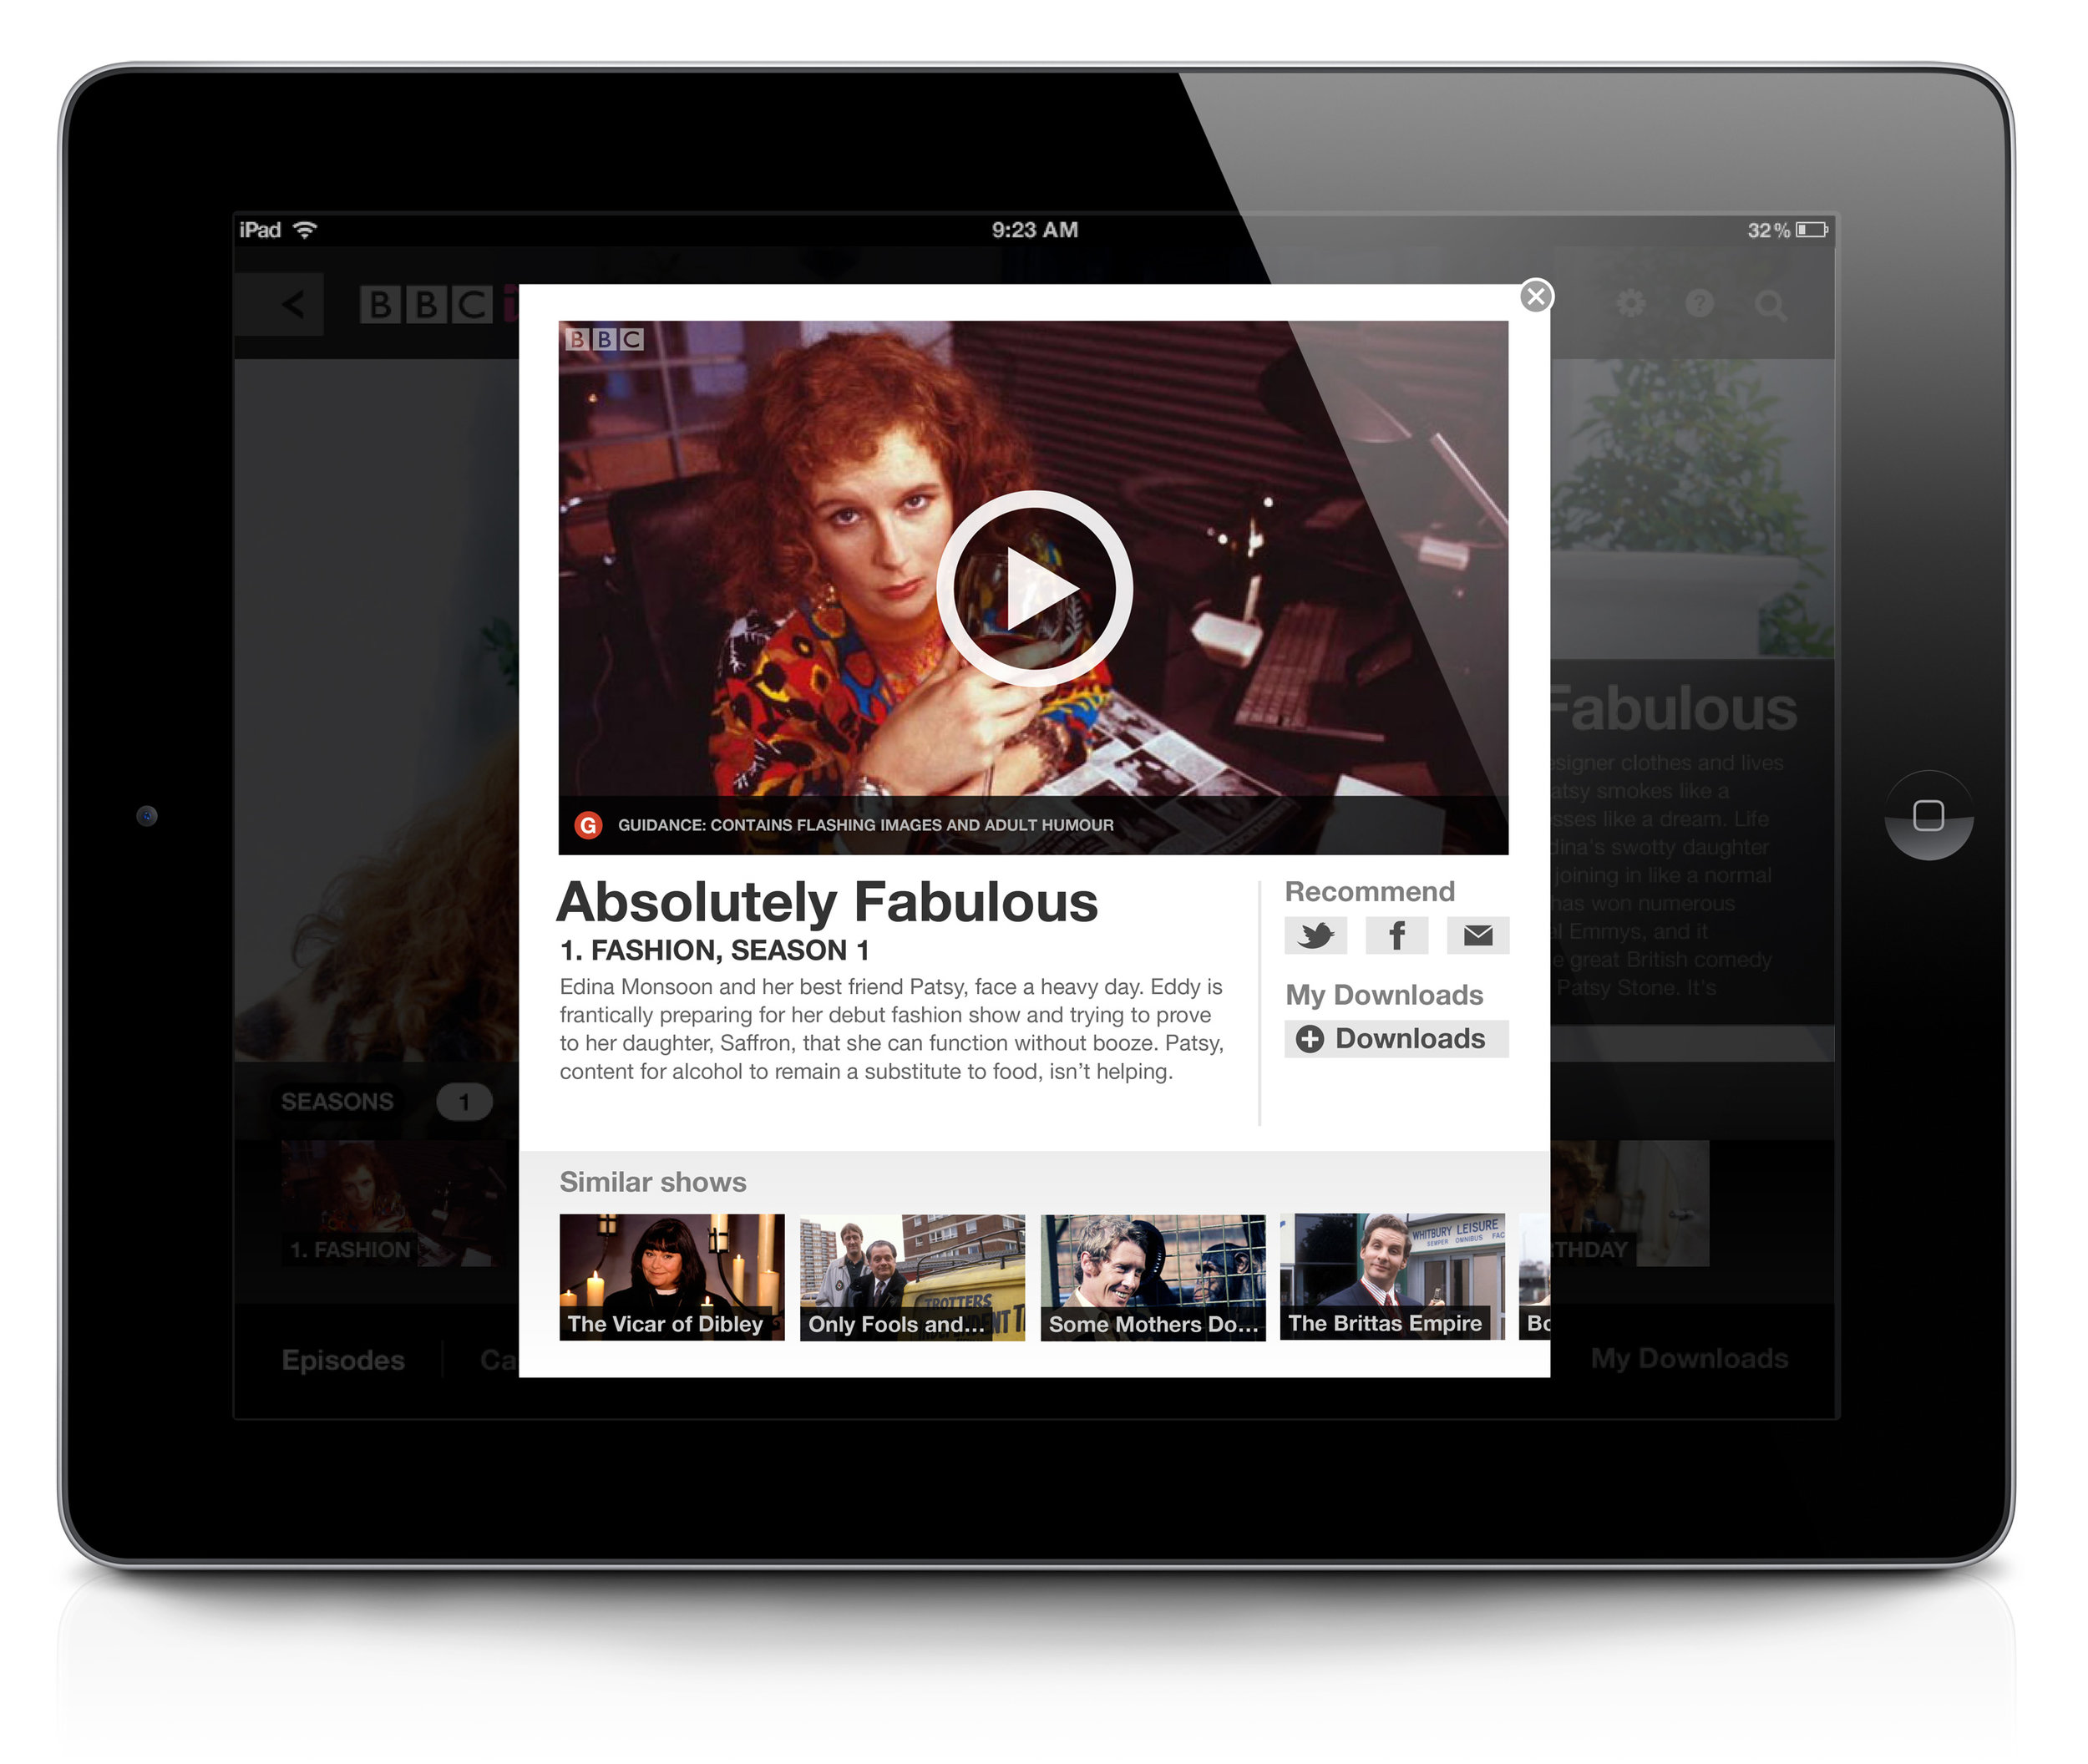 iPlayer_iPad2_episode.jpg